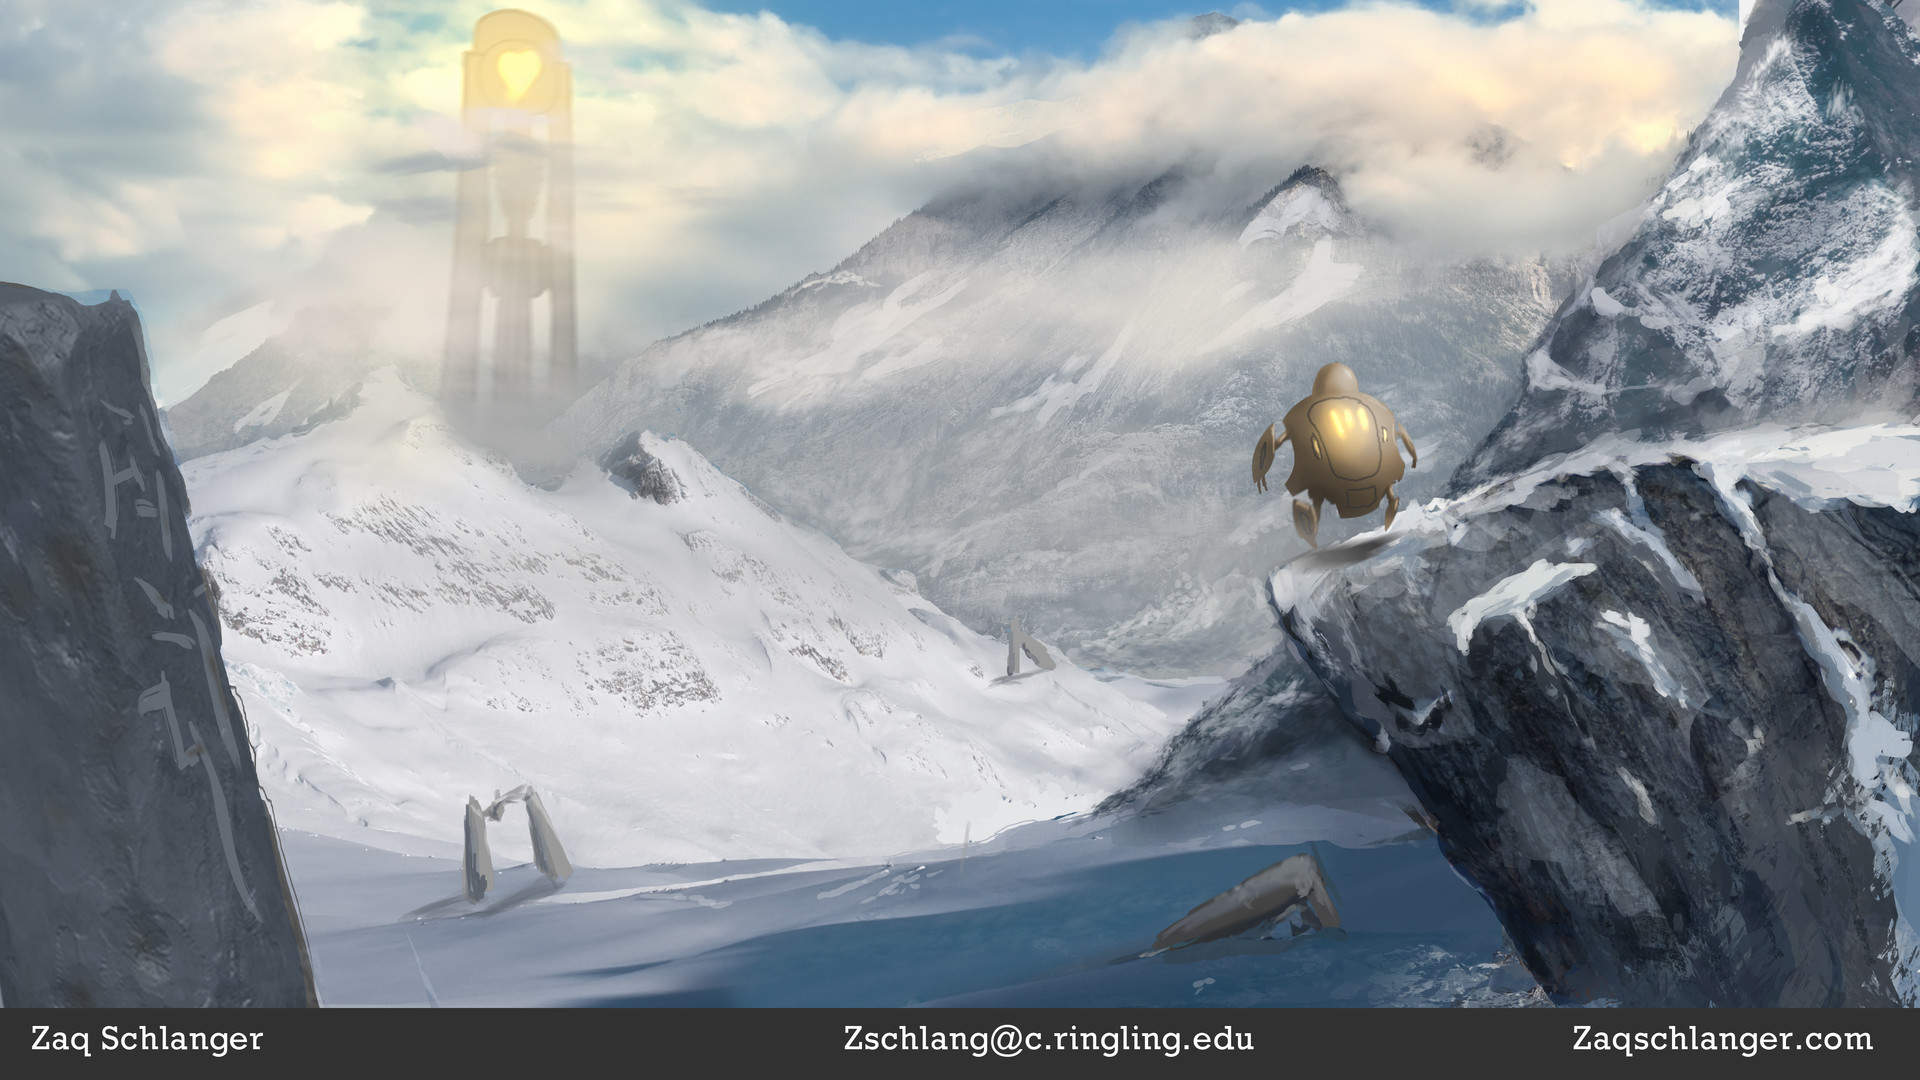 Zachary schlanger zschlang env 02